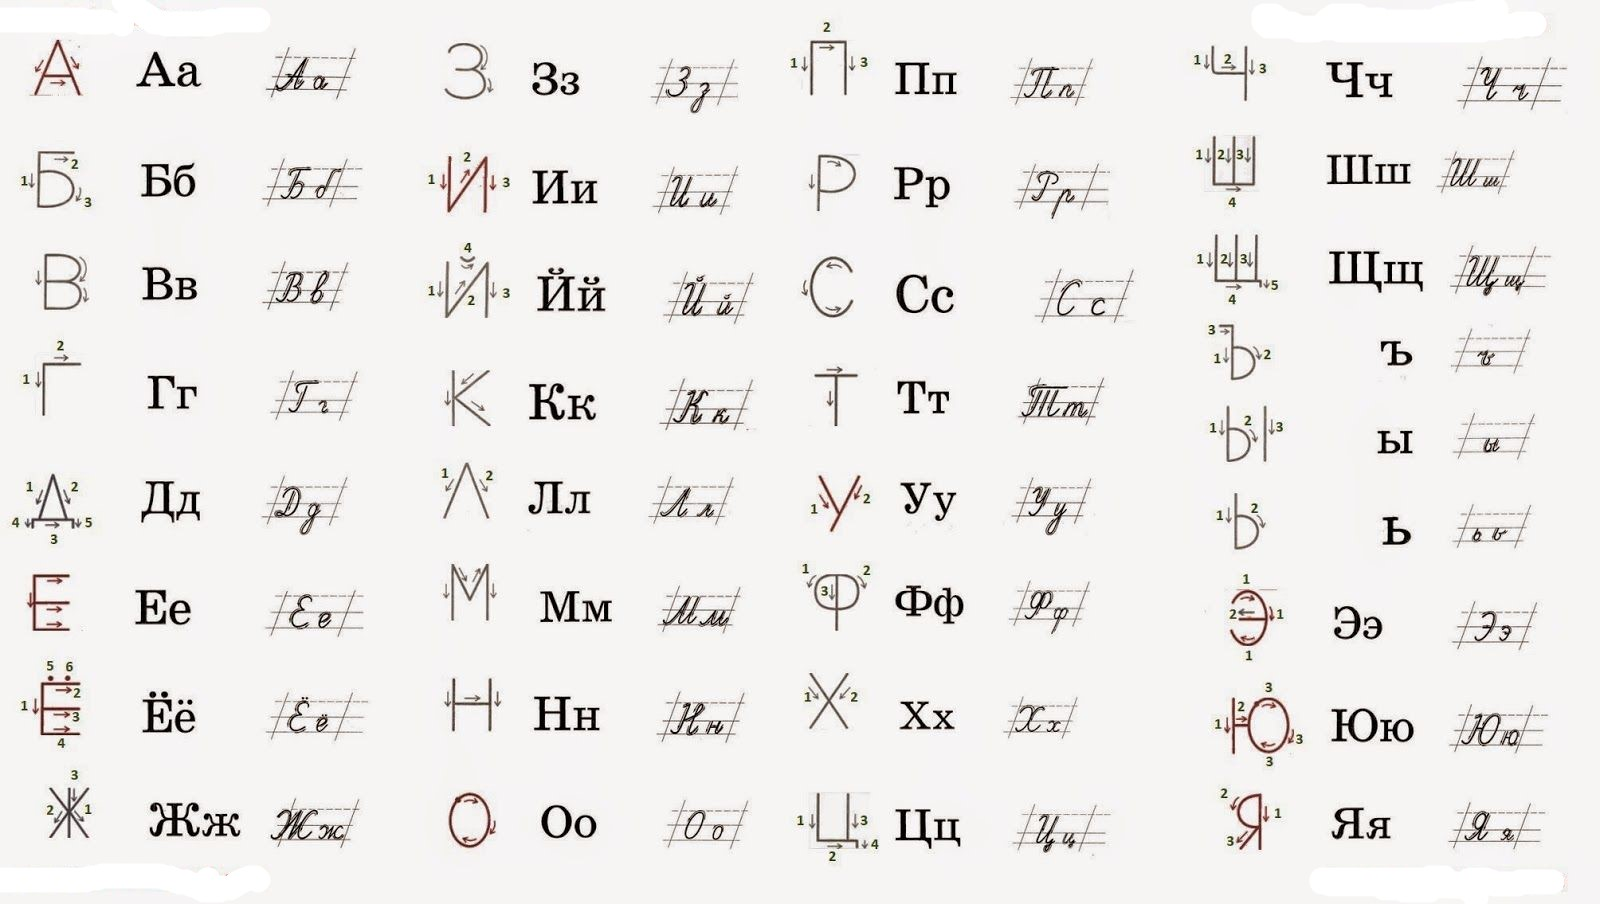 kiril alfabesi